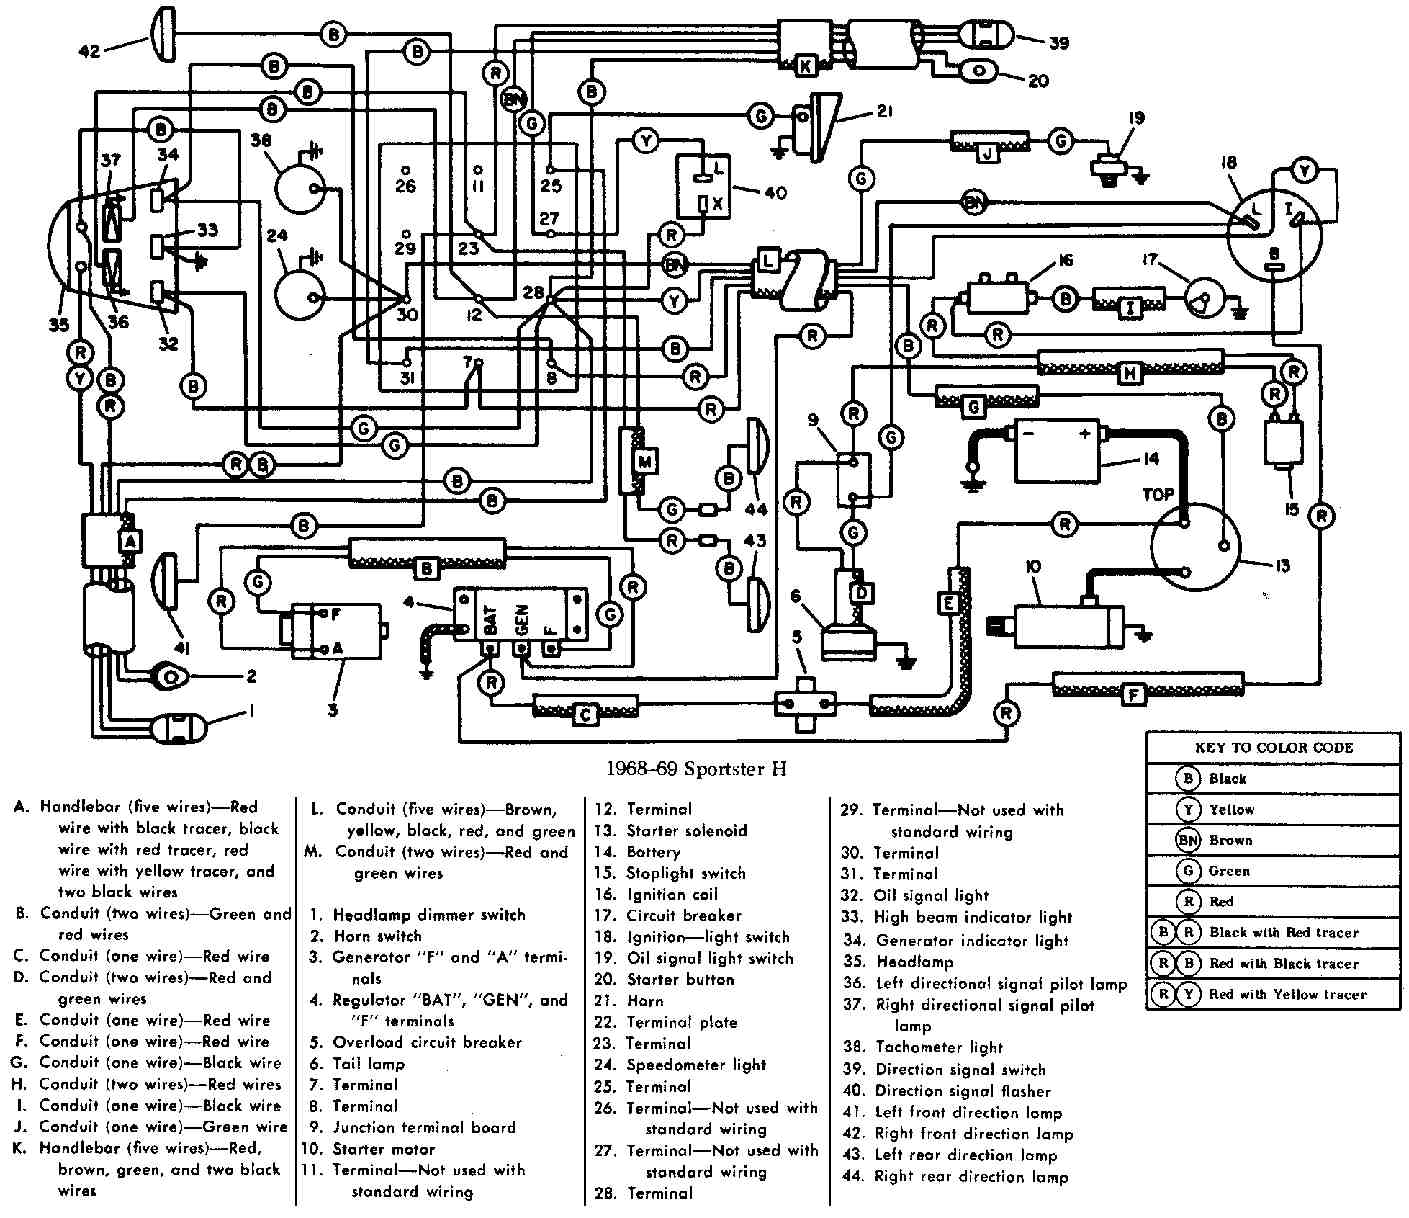 1969 Impala Dash Light Wiring Wire Data Schema Chevy Diagram Pontiac Rh Banyan Palace Com Convertible 1970 Interior